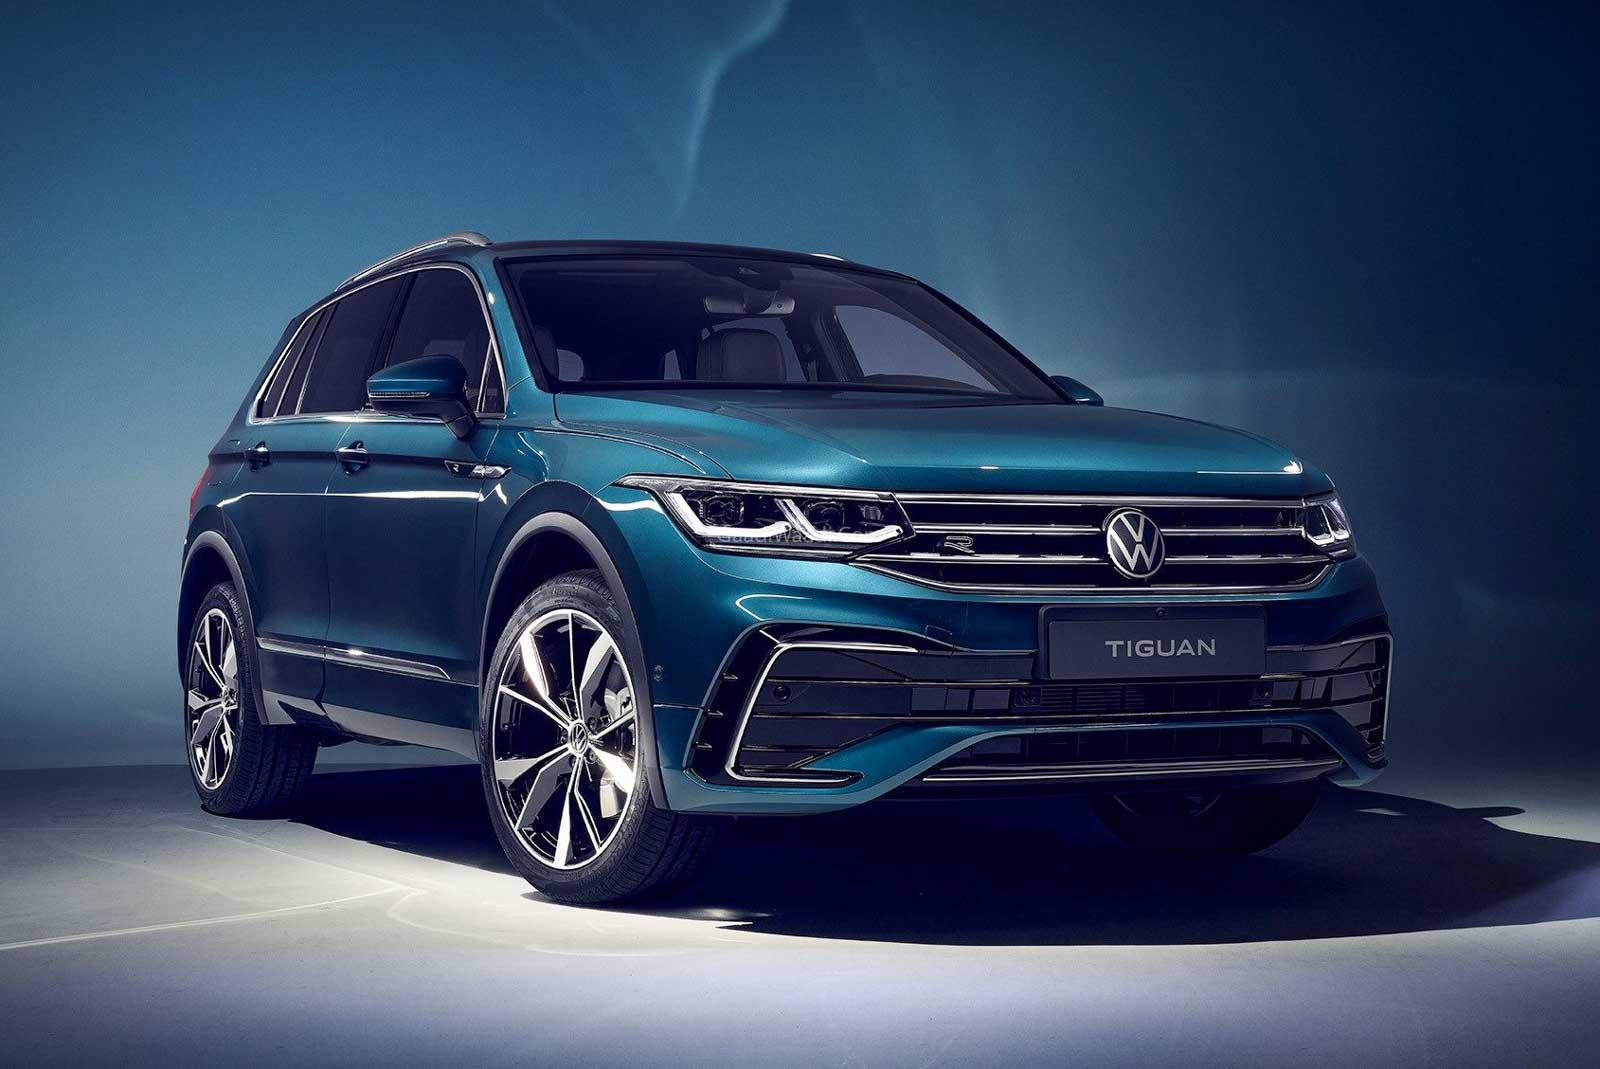 2021 Volkswagen Tiguan Facelift Revealed With Sharper Styling